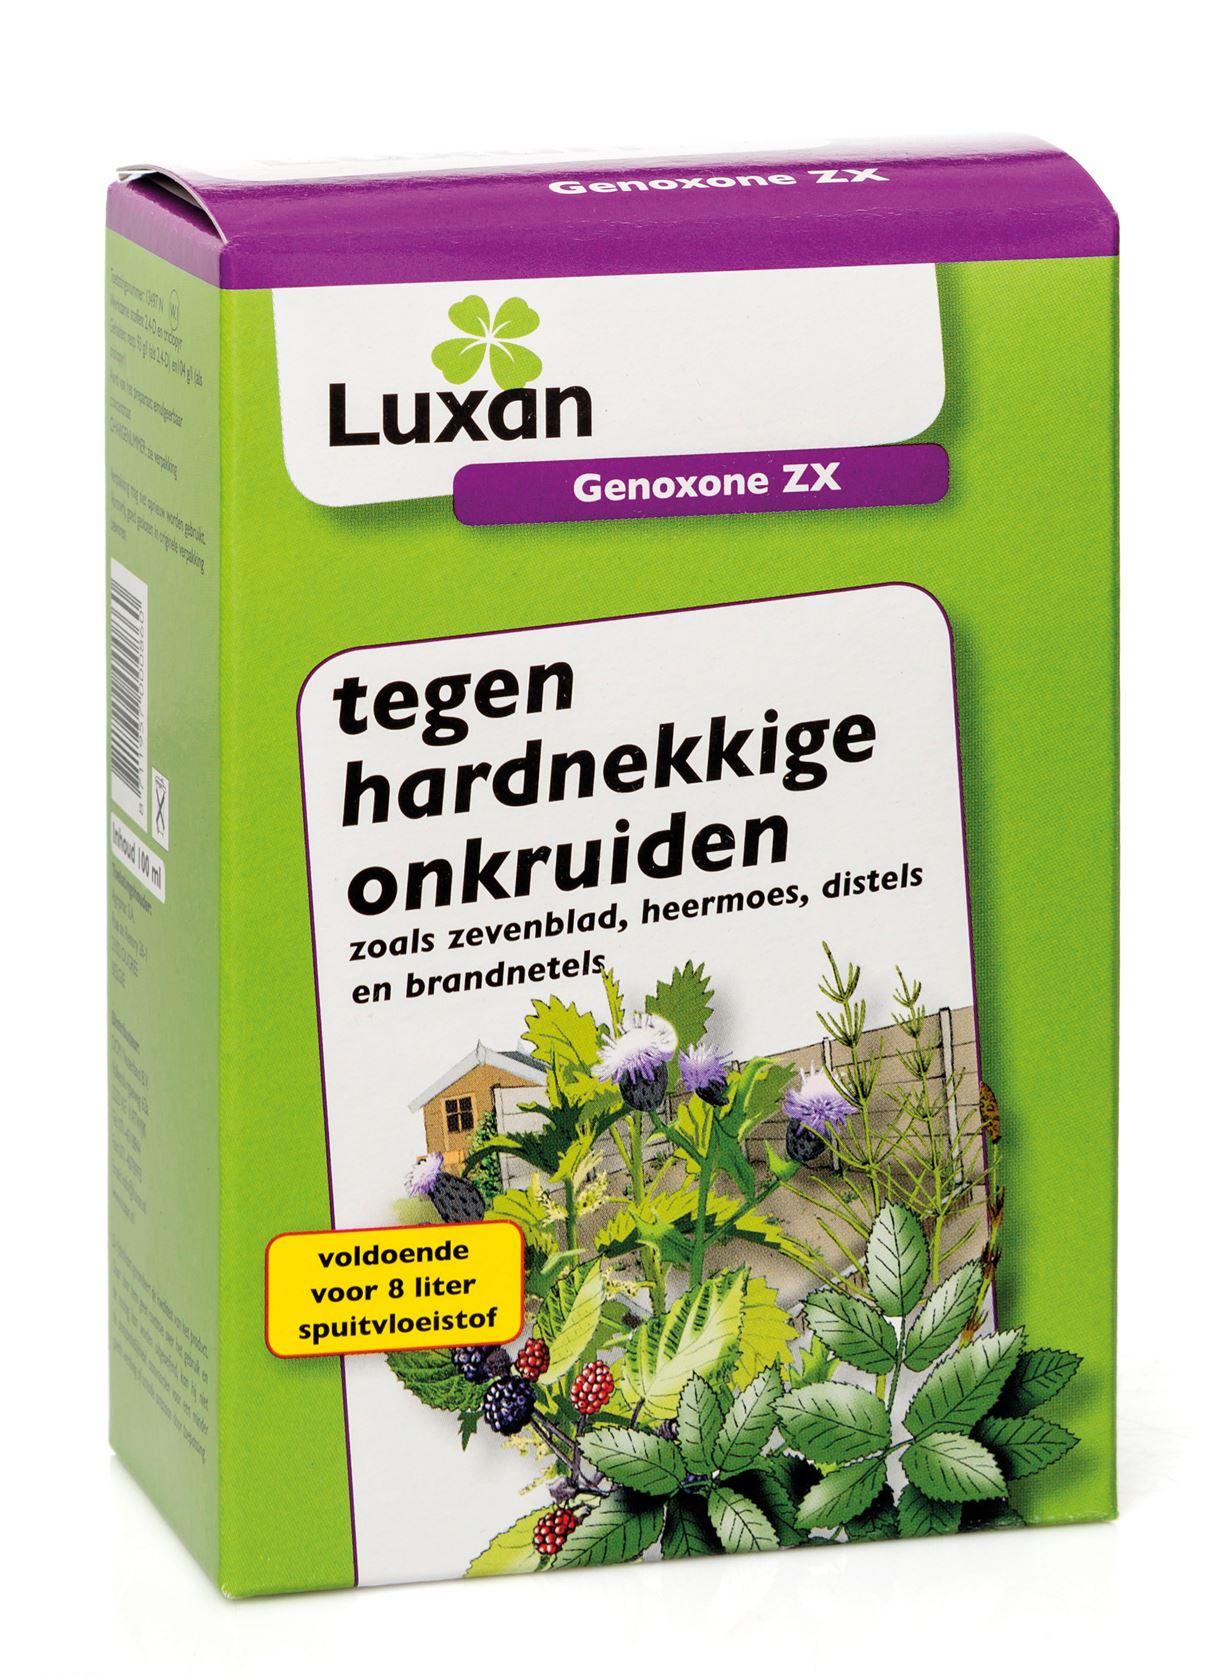 Luxan genoxone zx - 100 ml - tegen onkruiden (spaart grassen)